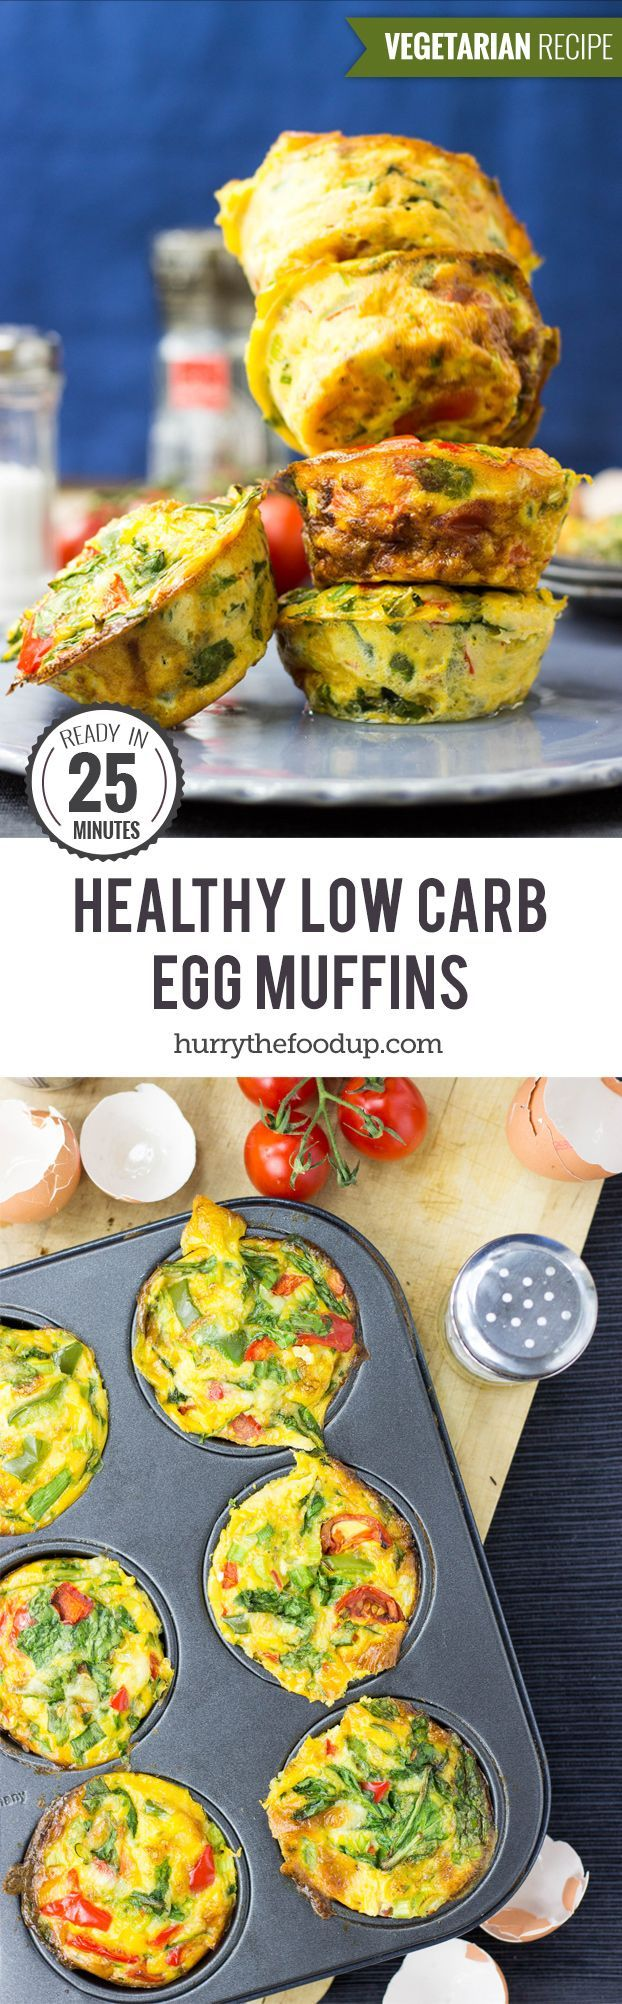 low carb egg breakfast muffins 25 minutes vegetarian rezept low carb recipes pinterest. Black Bedroom Furniture Sets. Home Design Ideas